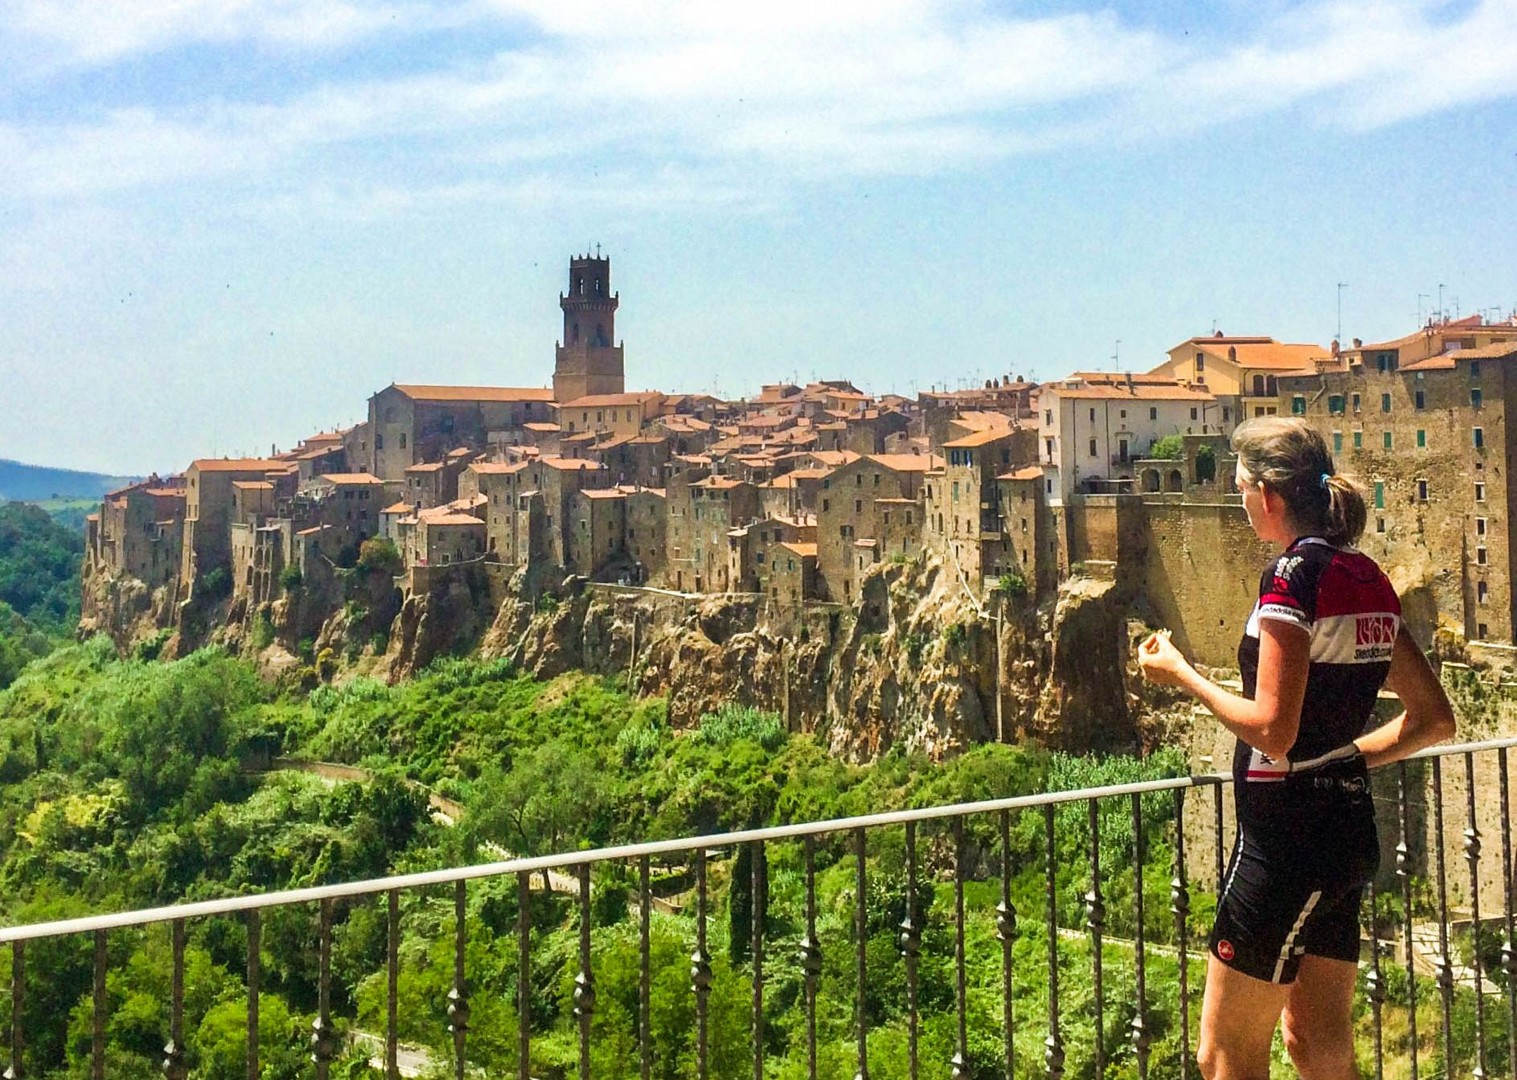 italian-cycling-trip-ladriatico-al-tirreno-guided-bike-holiday.jpg - NEW! Italy - Coast to Coast - L'Adriatico al Tirreno - Road Cycling